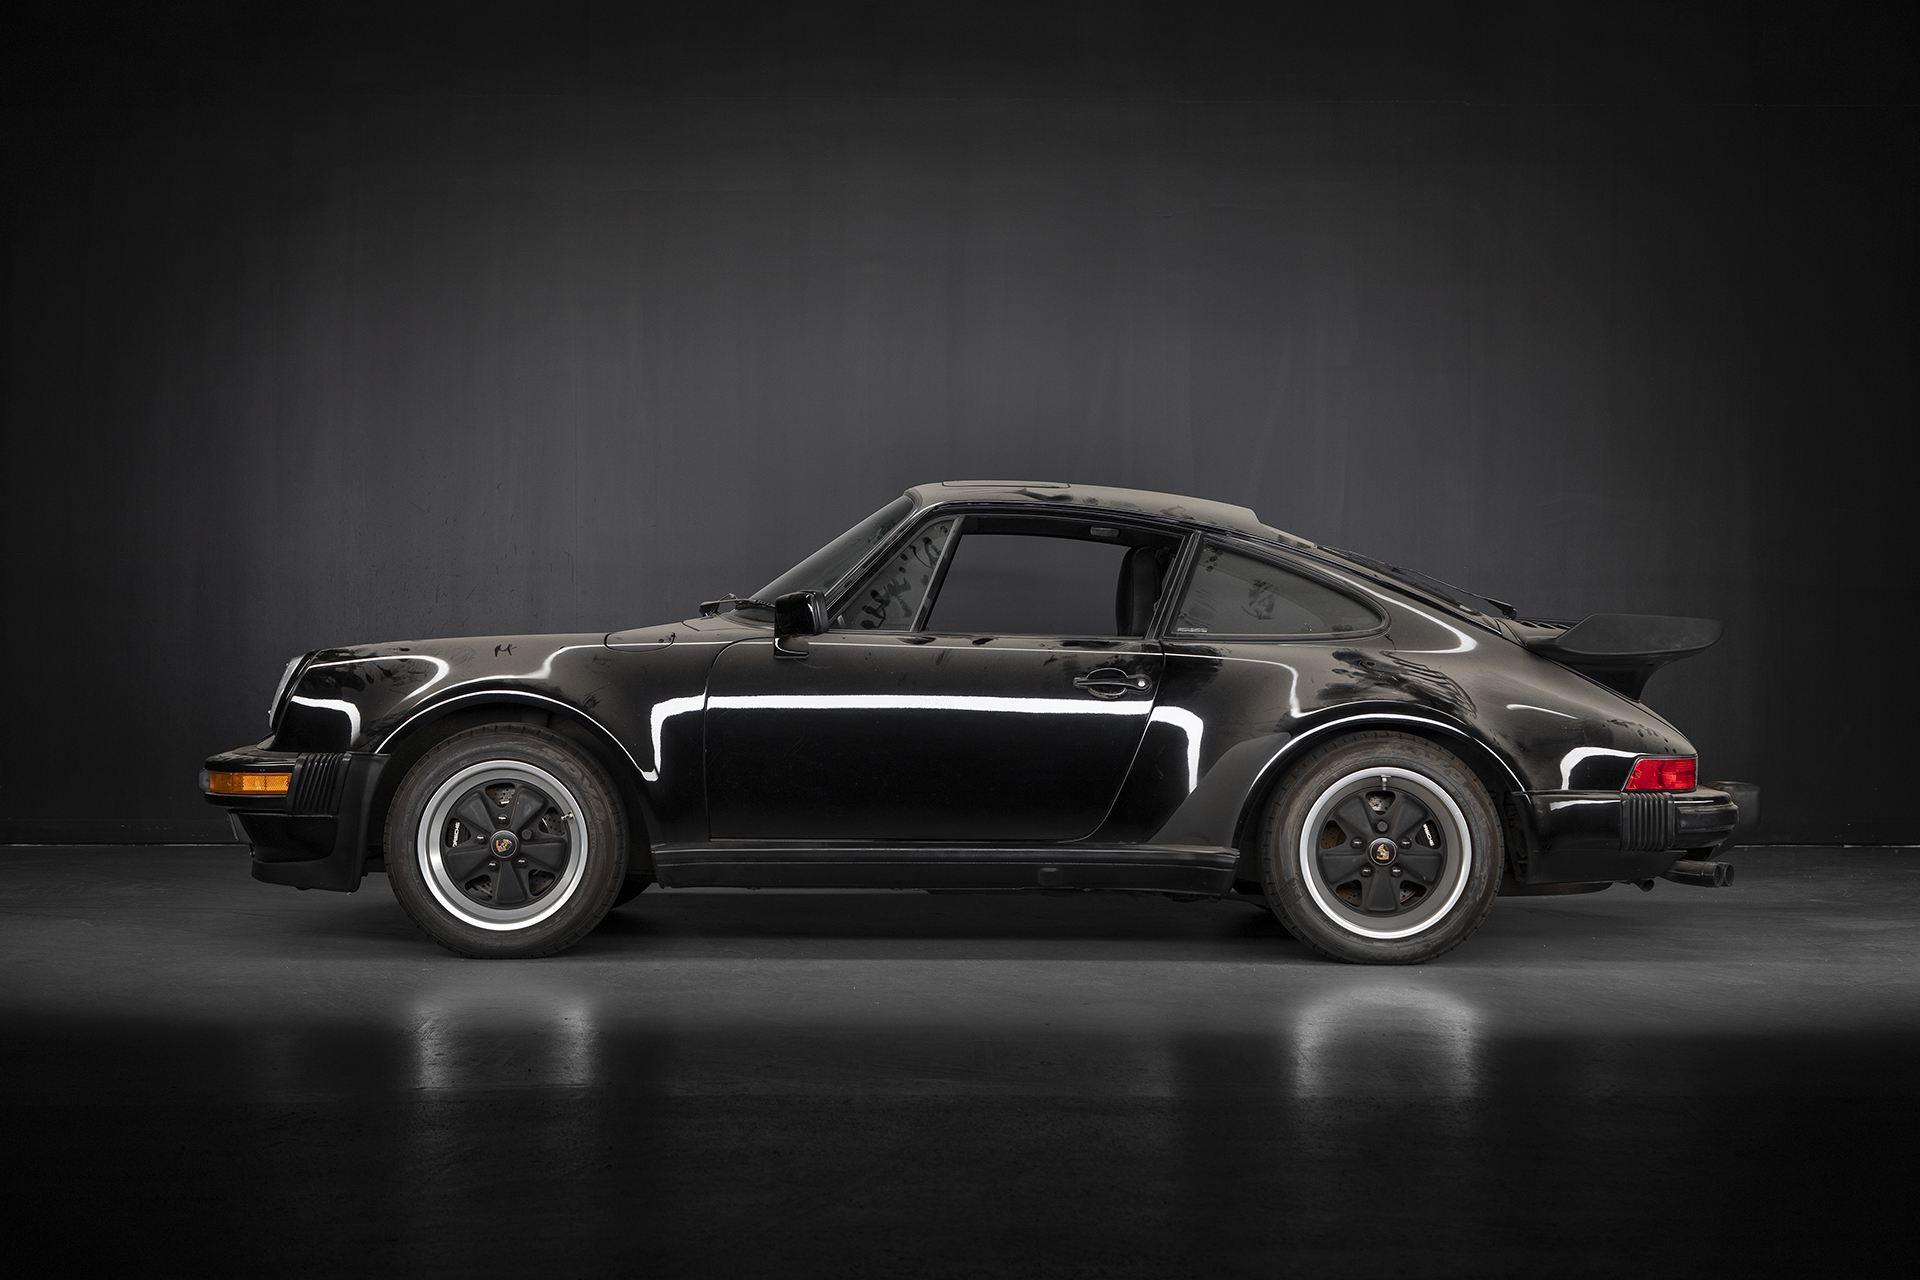 Porsche 930 911 Turbo